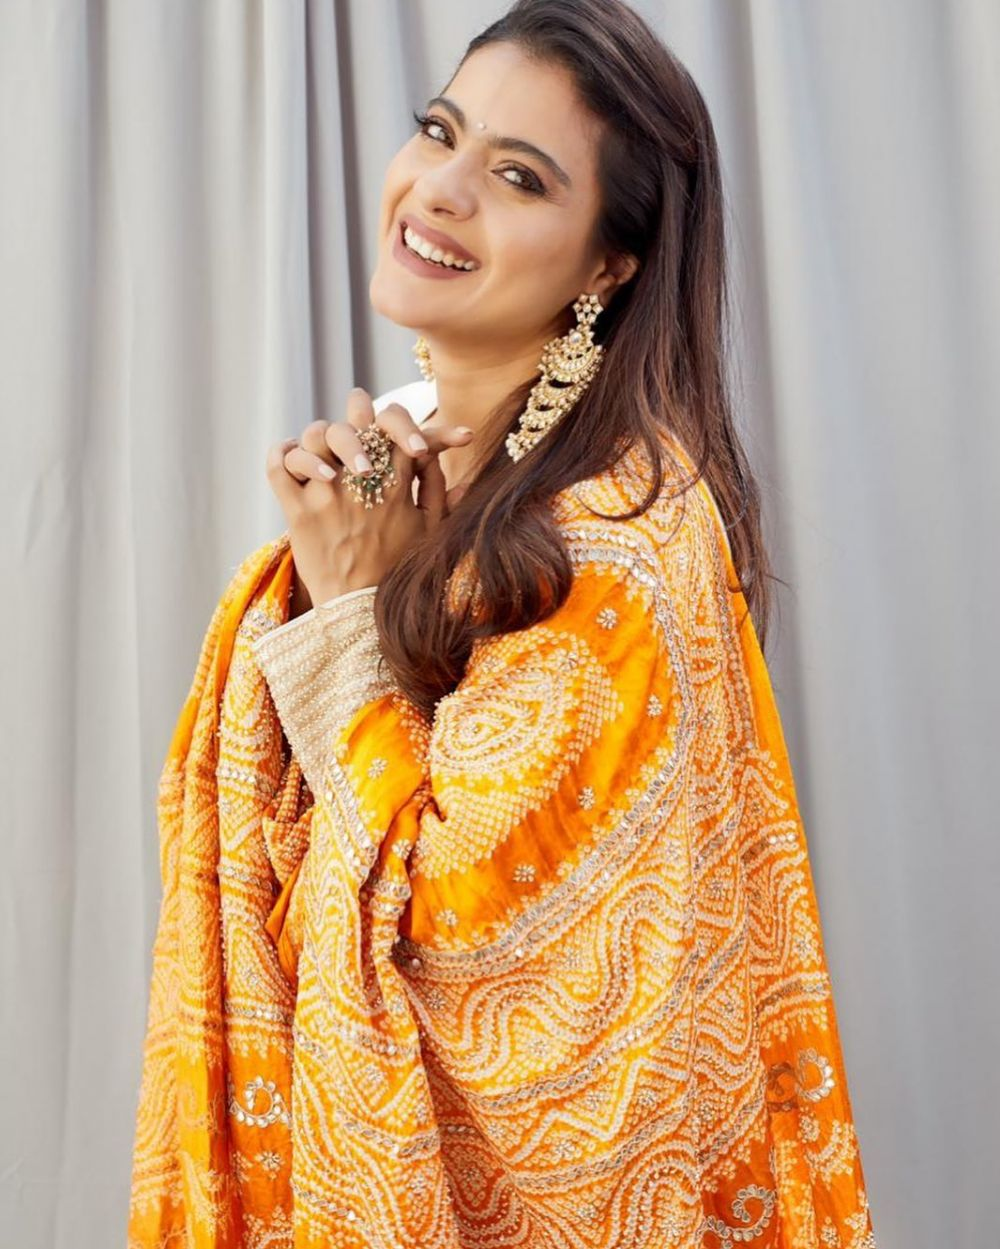 nama asli aktris Bollywood © 2021 brilio.net